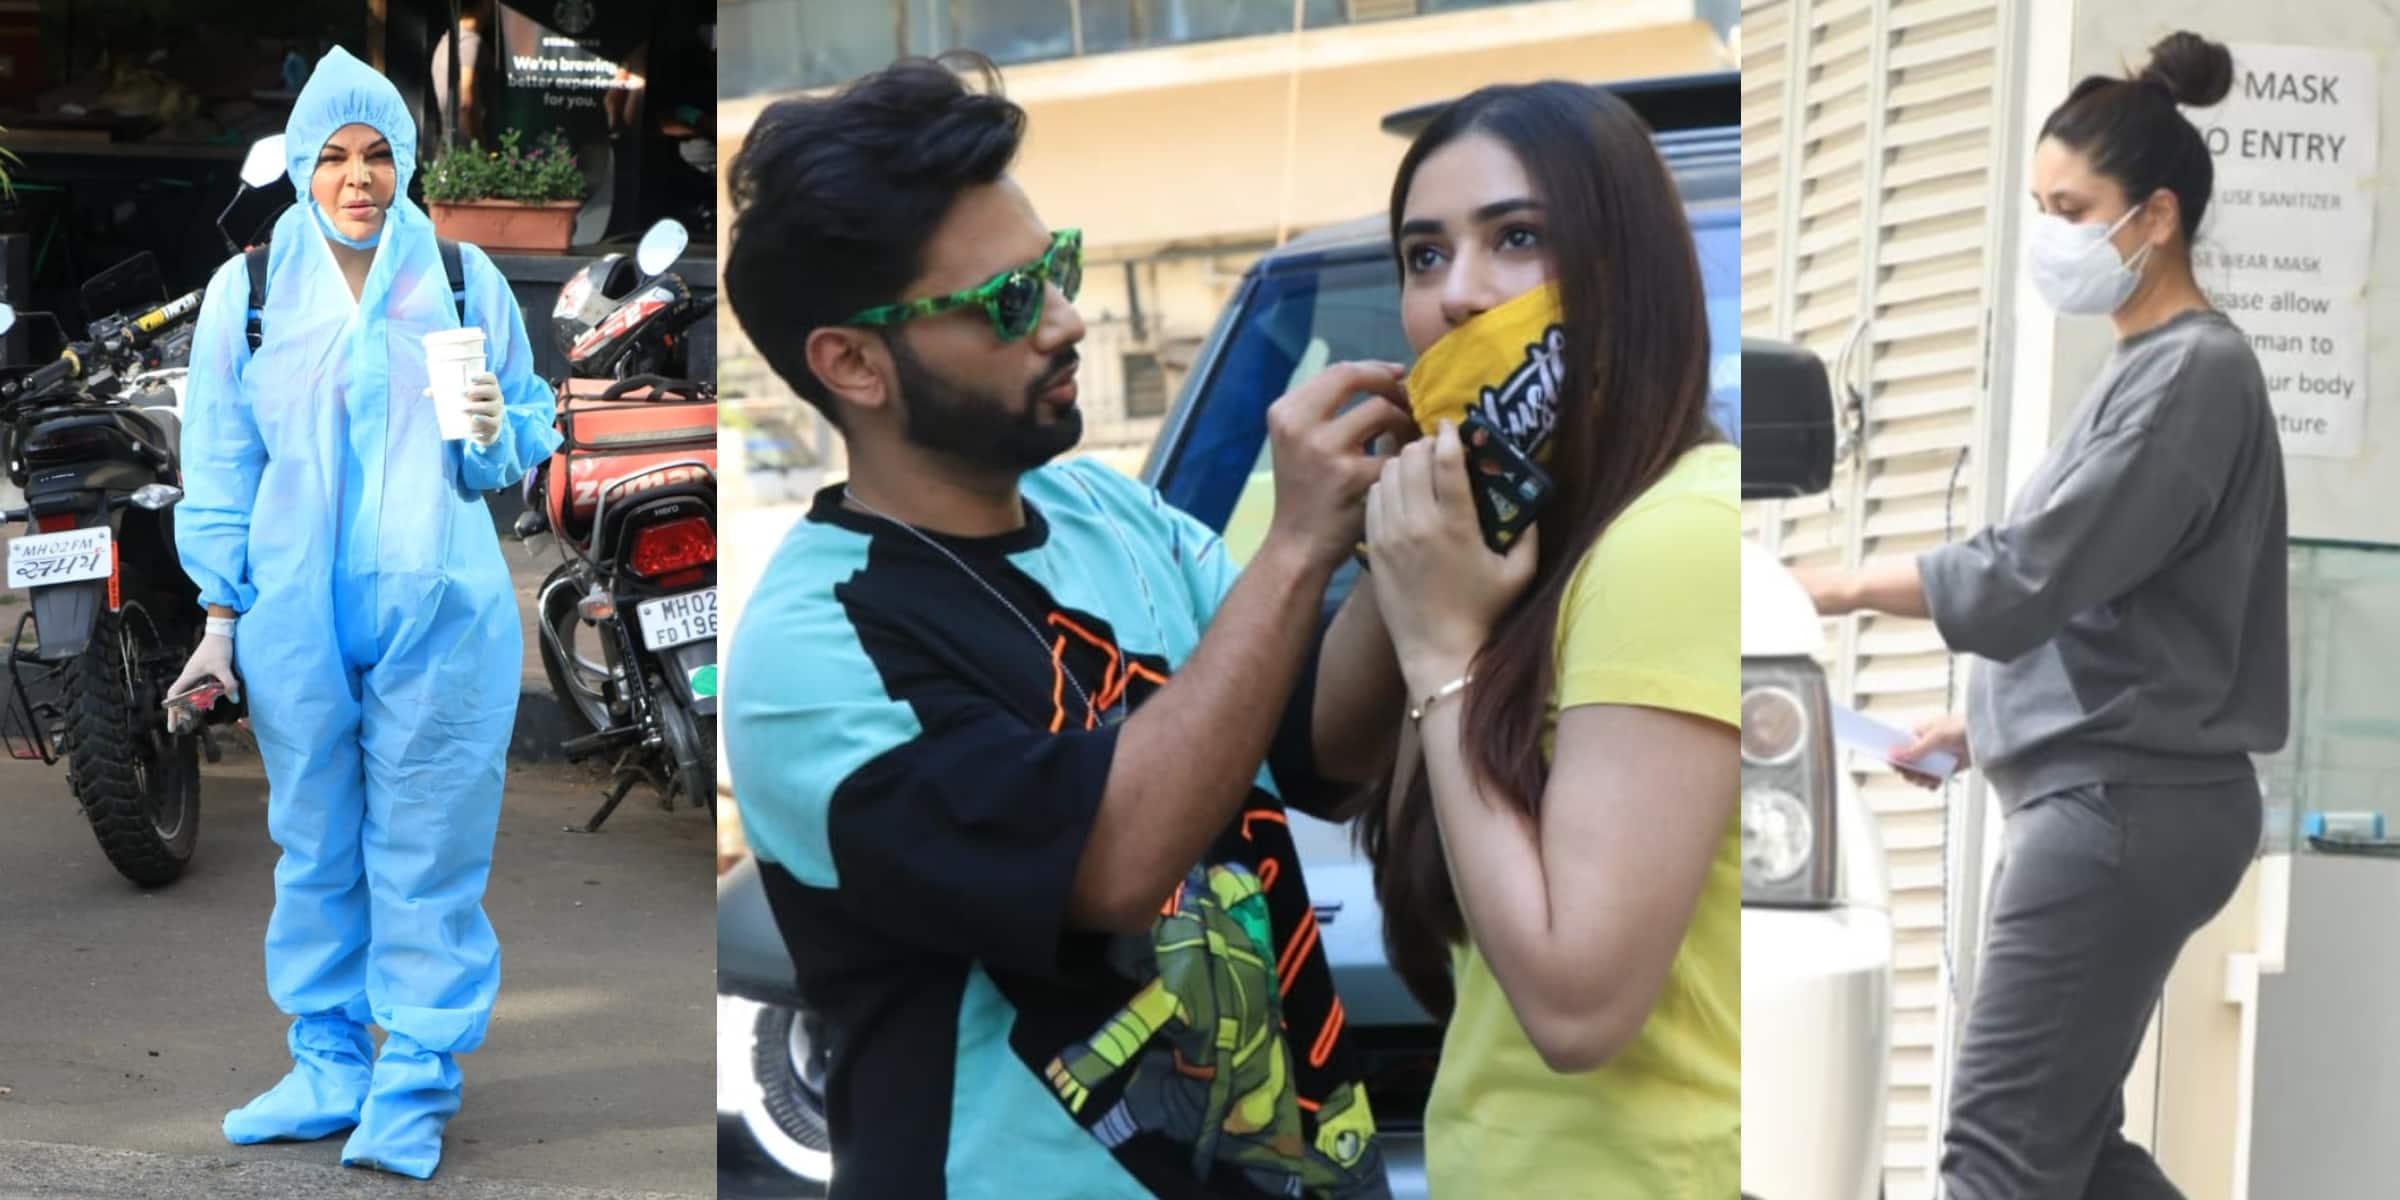 Spotted: Kareena Goes To A Clinic, Rahul Vaidya Helps Disha Take Off Her Mask, Rakhi Sawant Goes To Grab Coffee